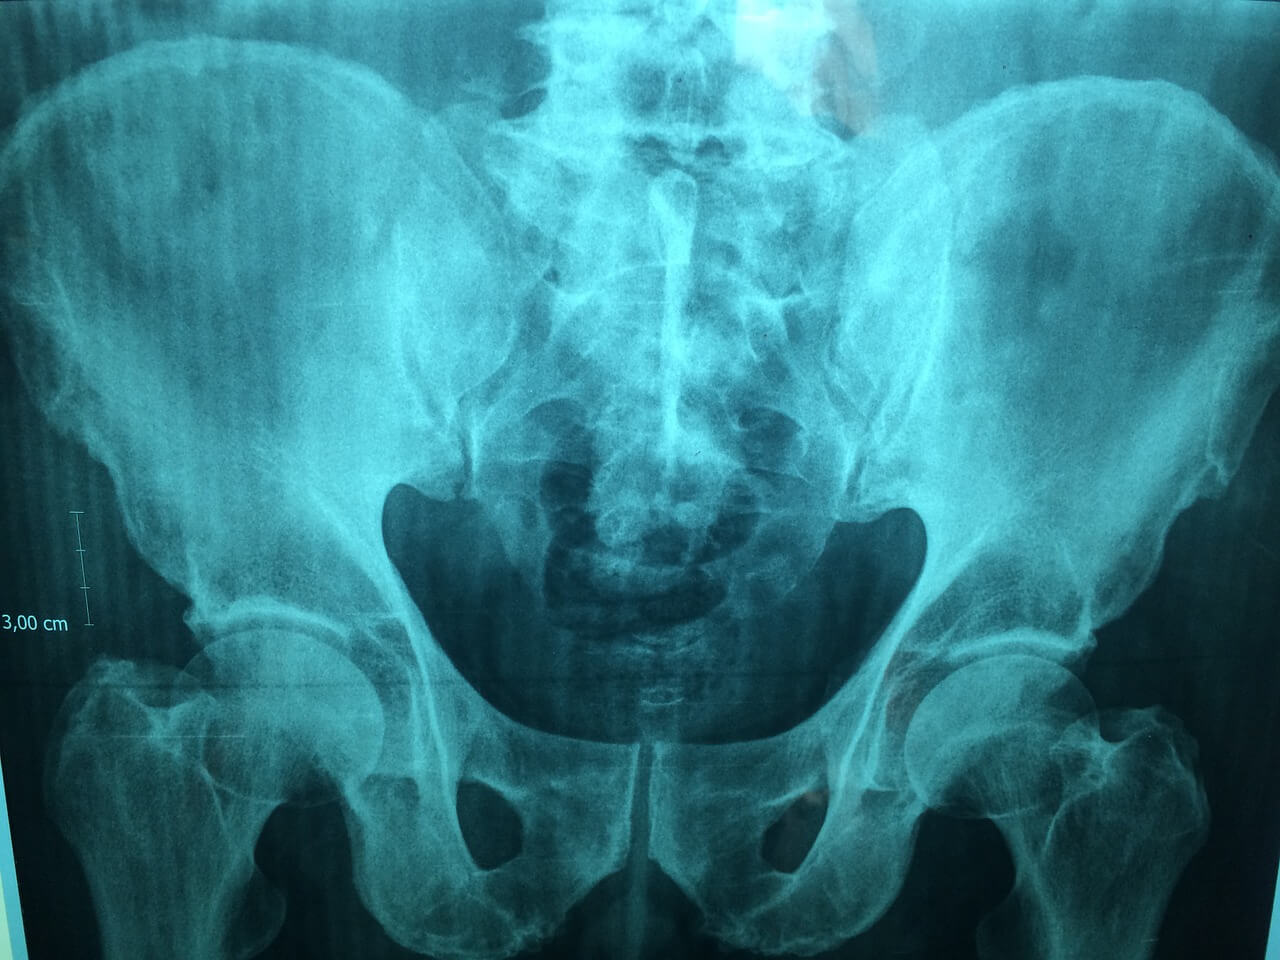 Broken pelvis caused by accident at work